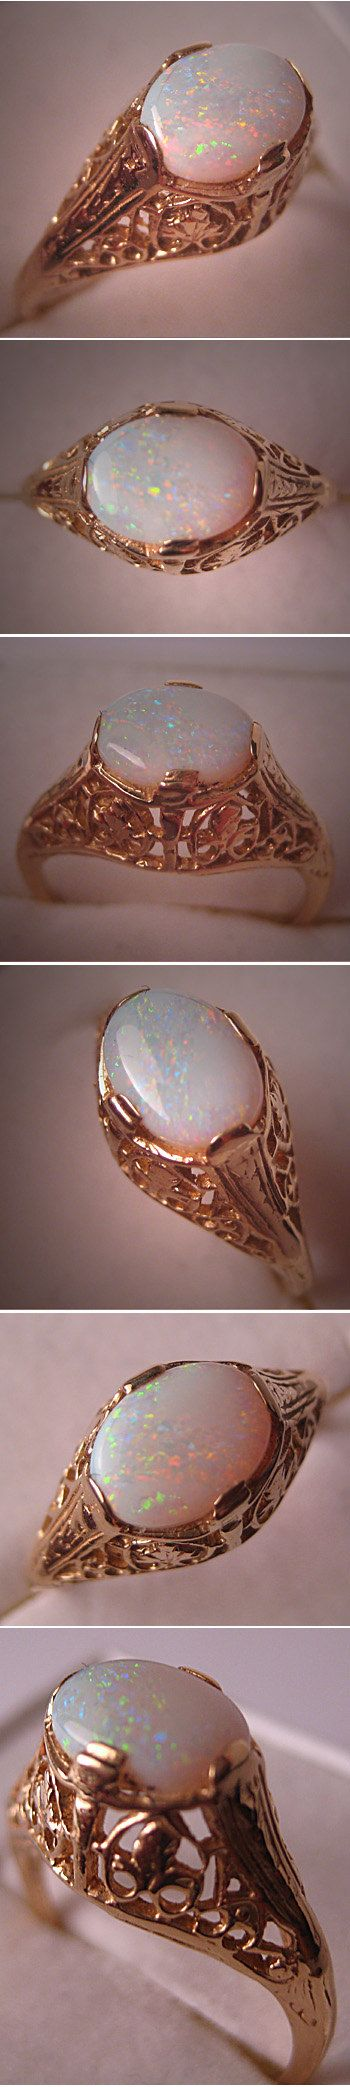 Vintage Australian Opal Ring Gold Filigree by AawsombleiJewelry, $695.00